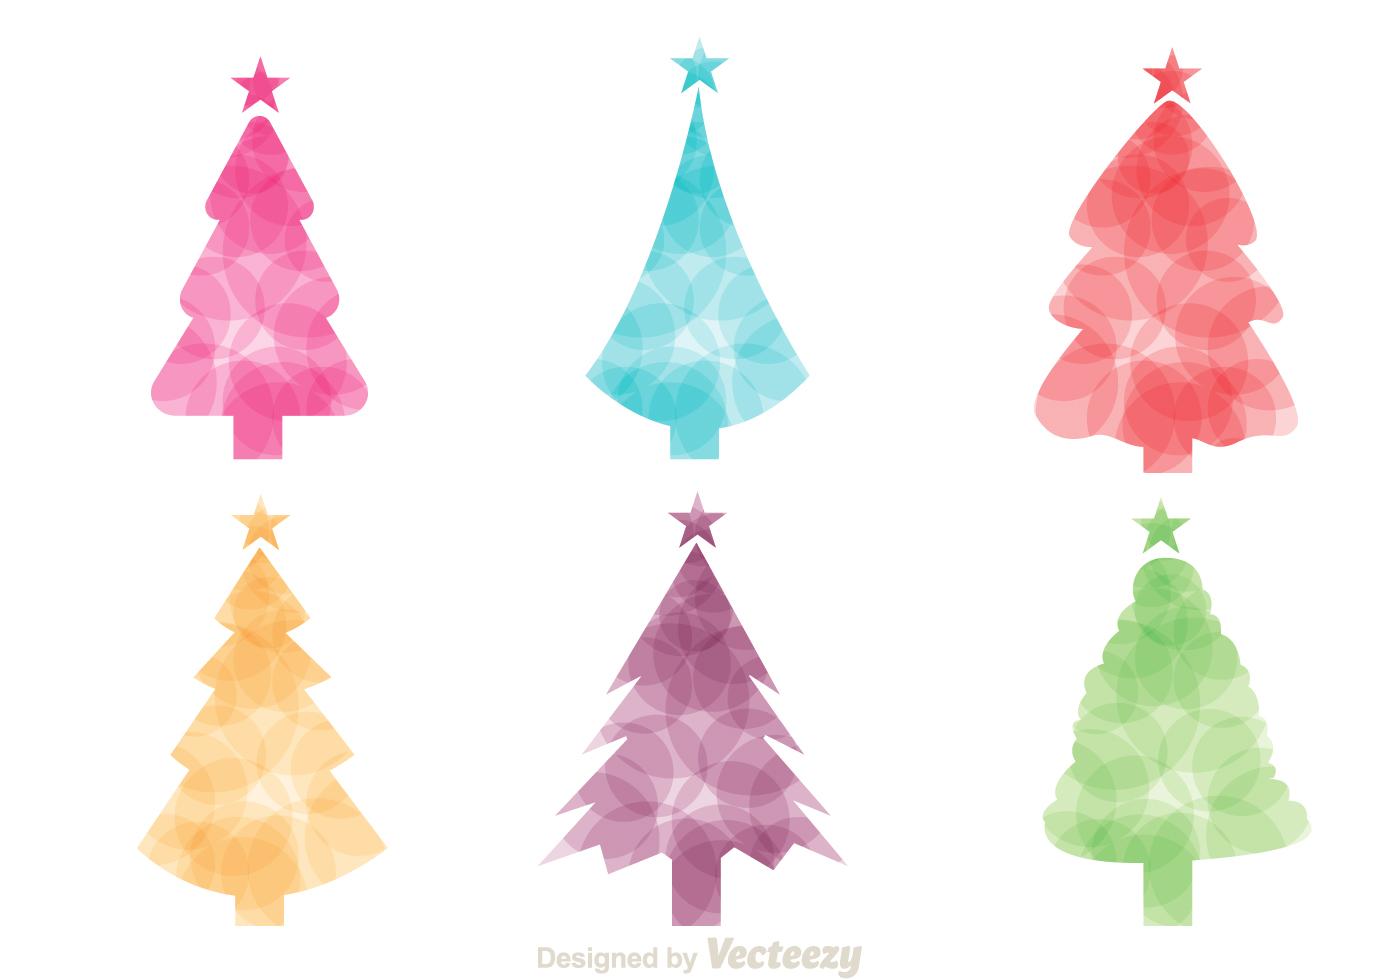 Christmas Tree Decorations Vector Free : Colorful christmas tree silhouette vectors download free